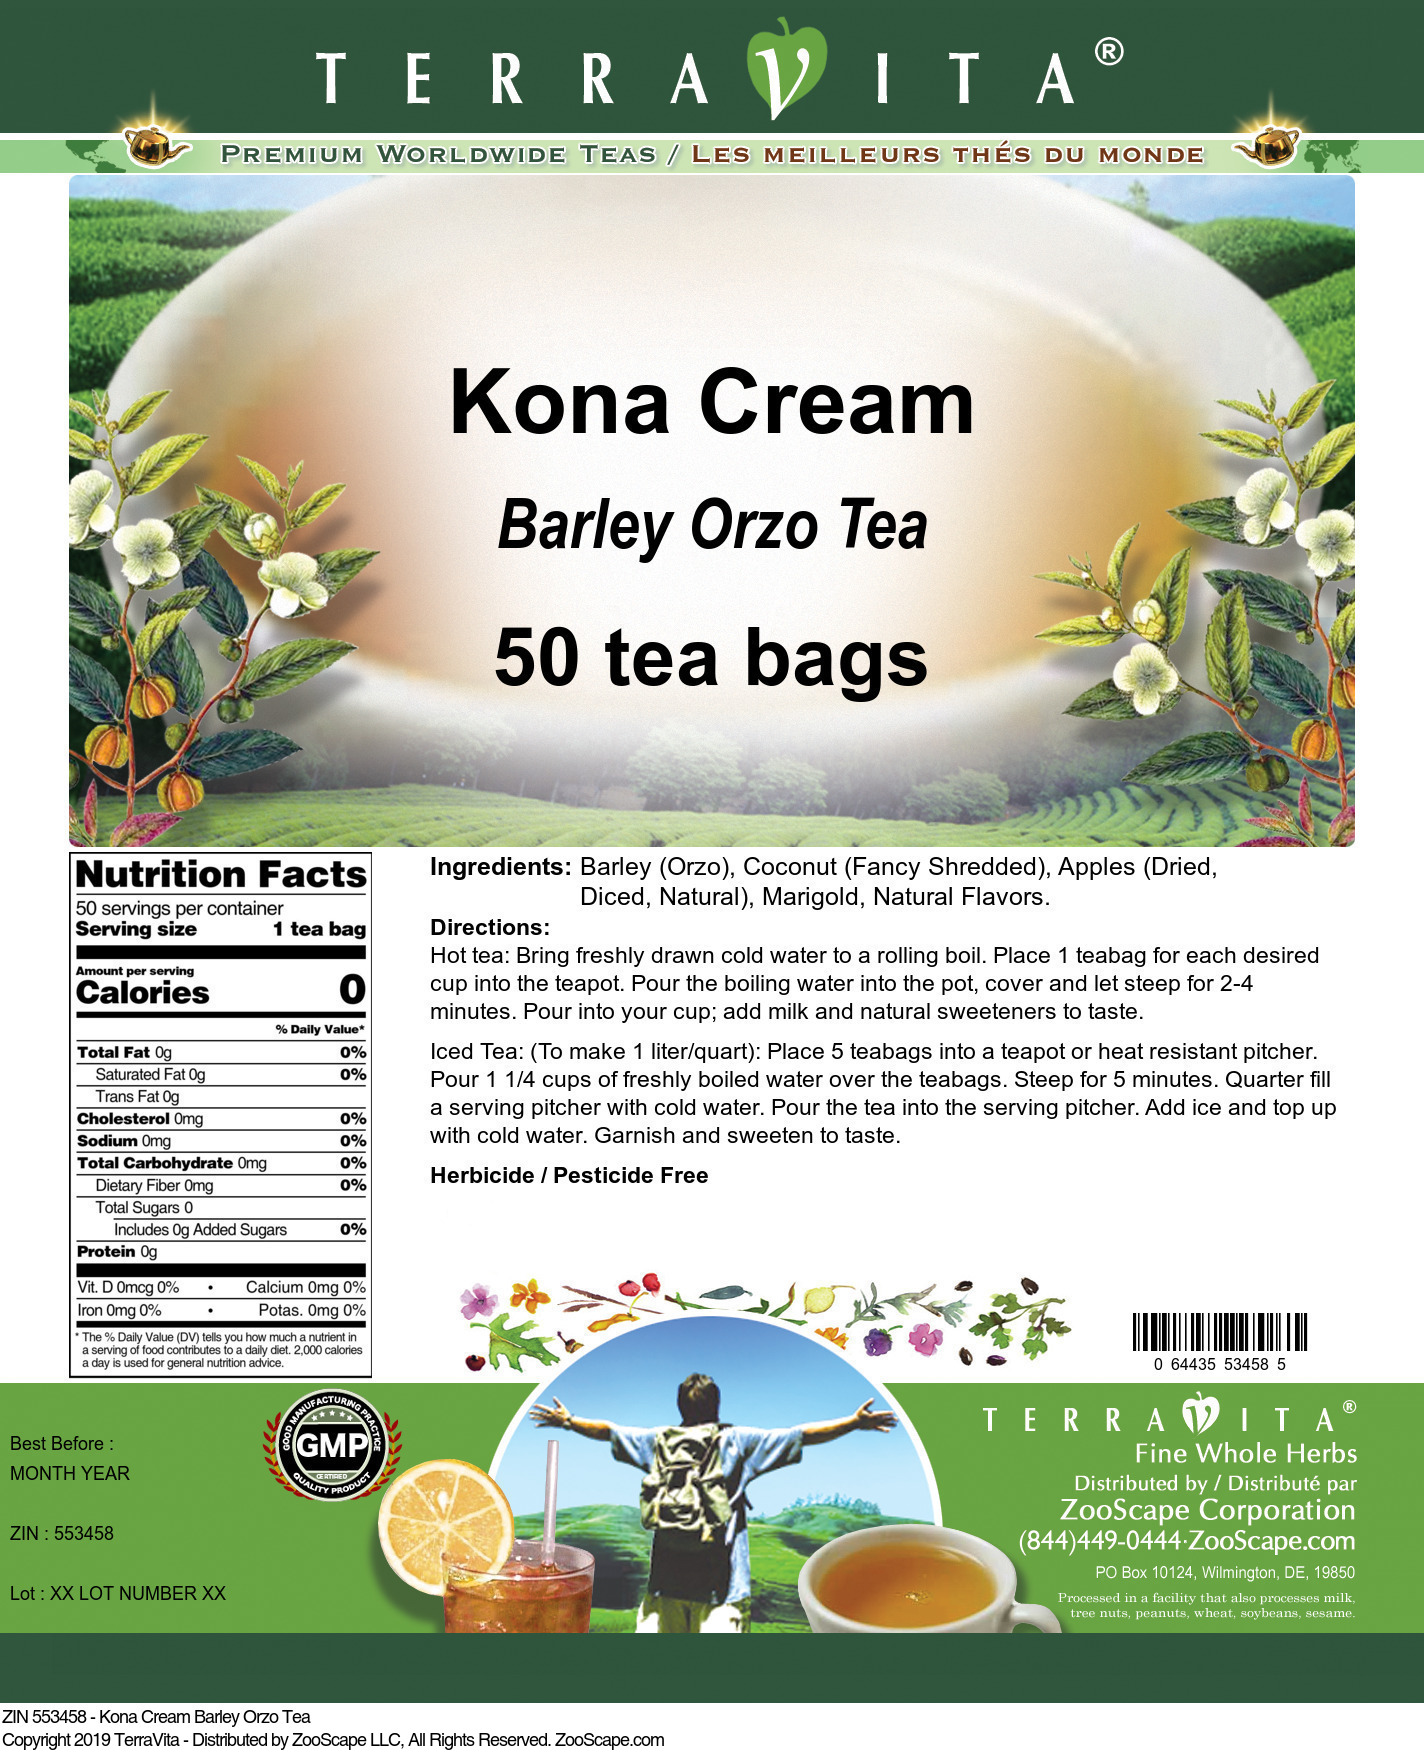 Kona Cream Barley Orzo